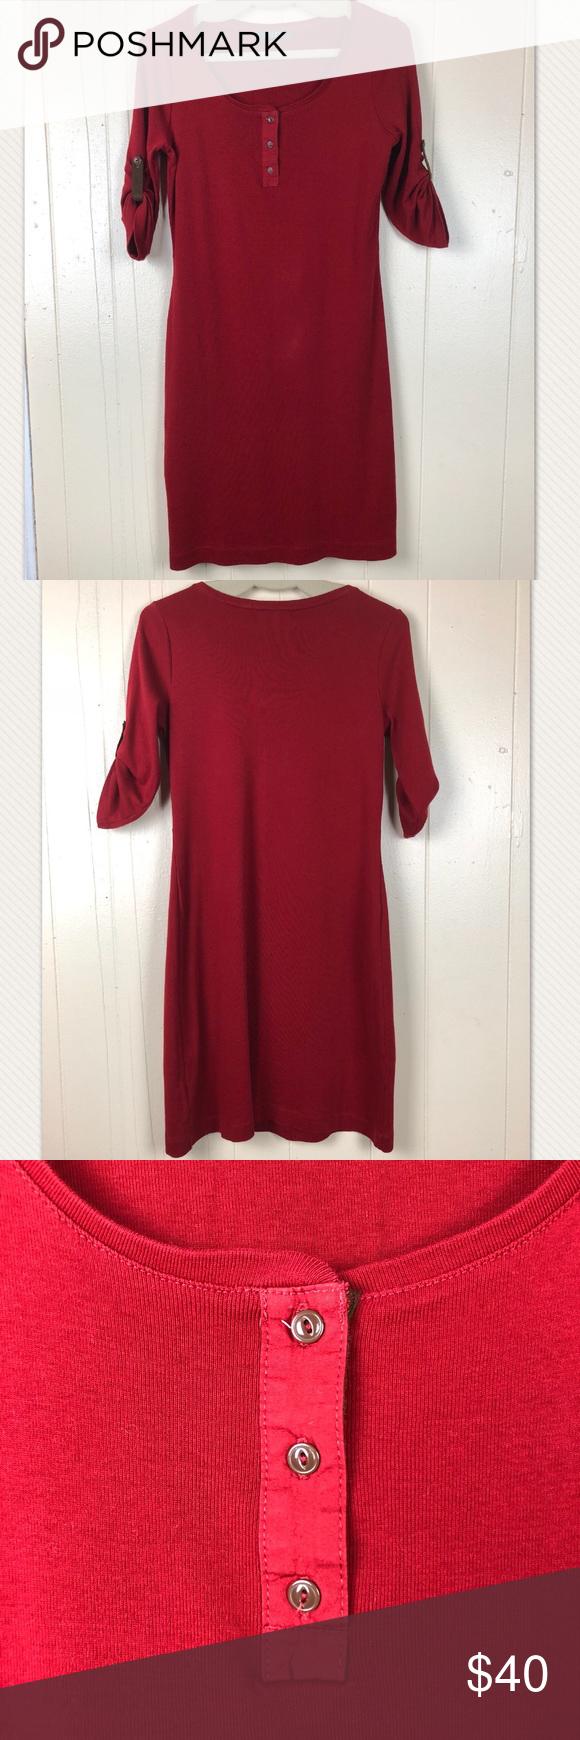 Ralph lauren red dress cotton stretch large dress necklines